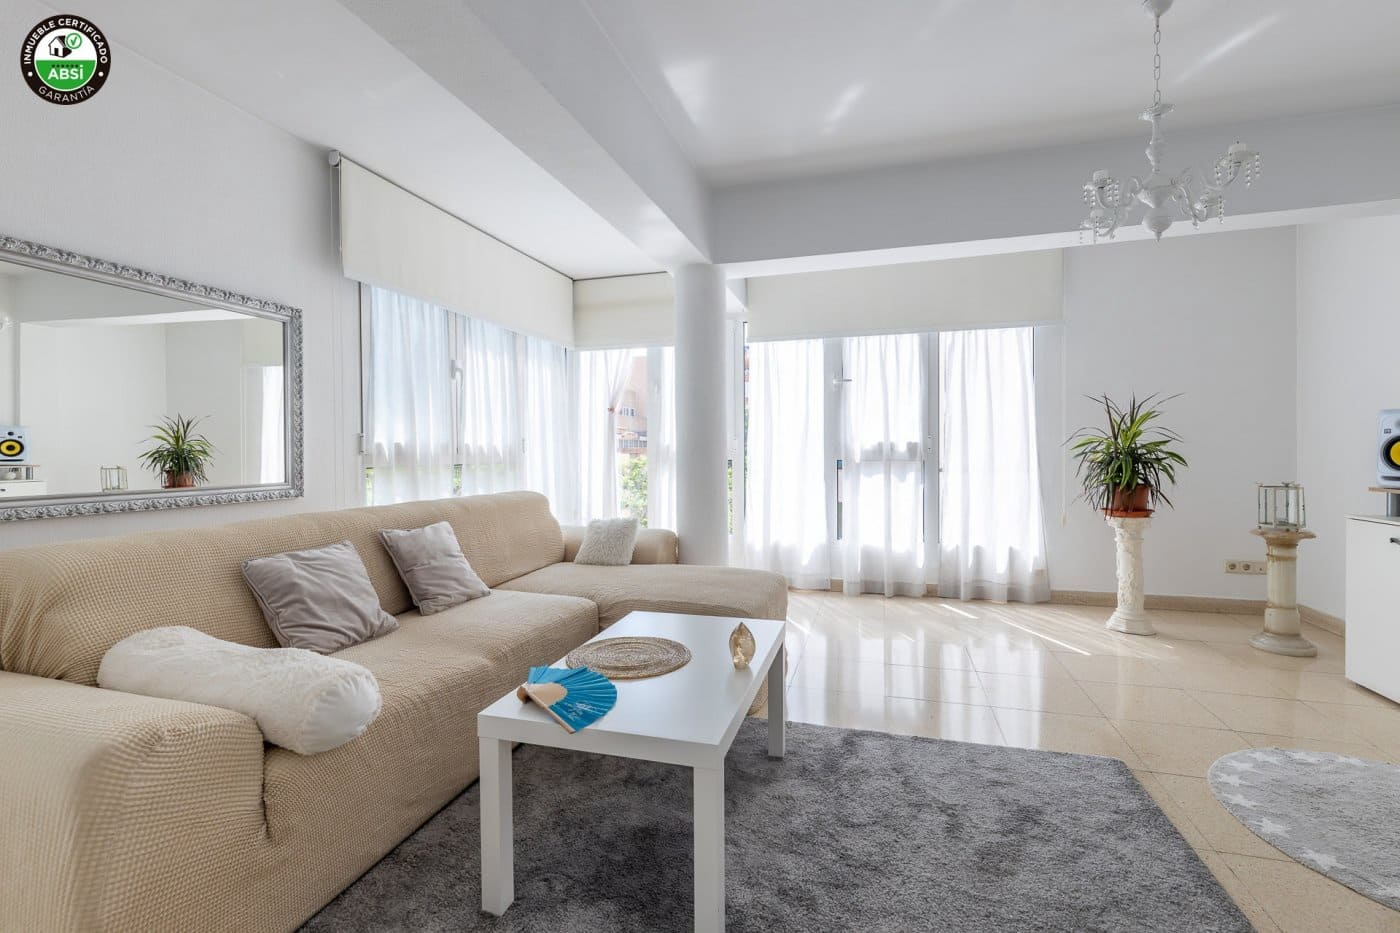 3 bedroom Flat for sale in Palma de Mallorca - € 225,000 (Ref: 6242435)